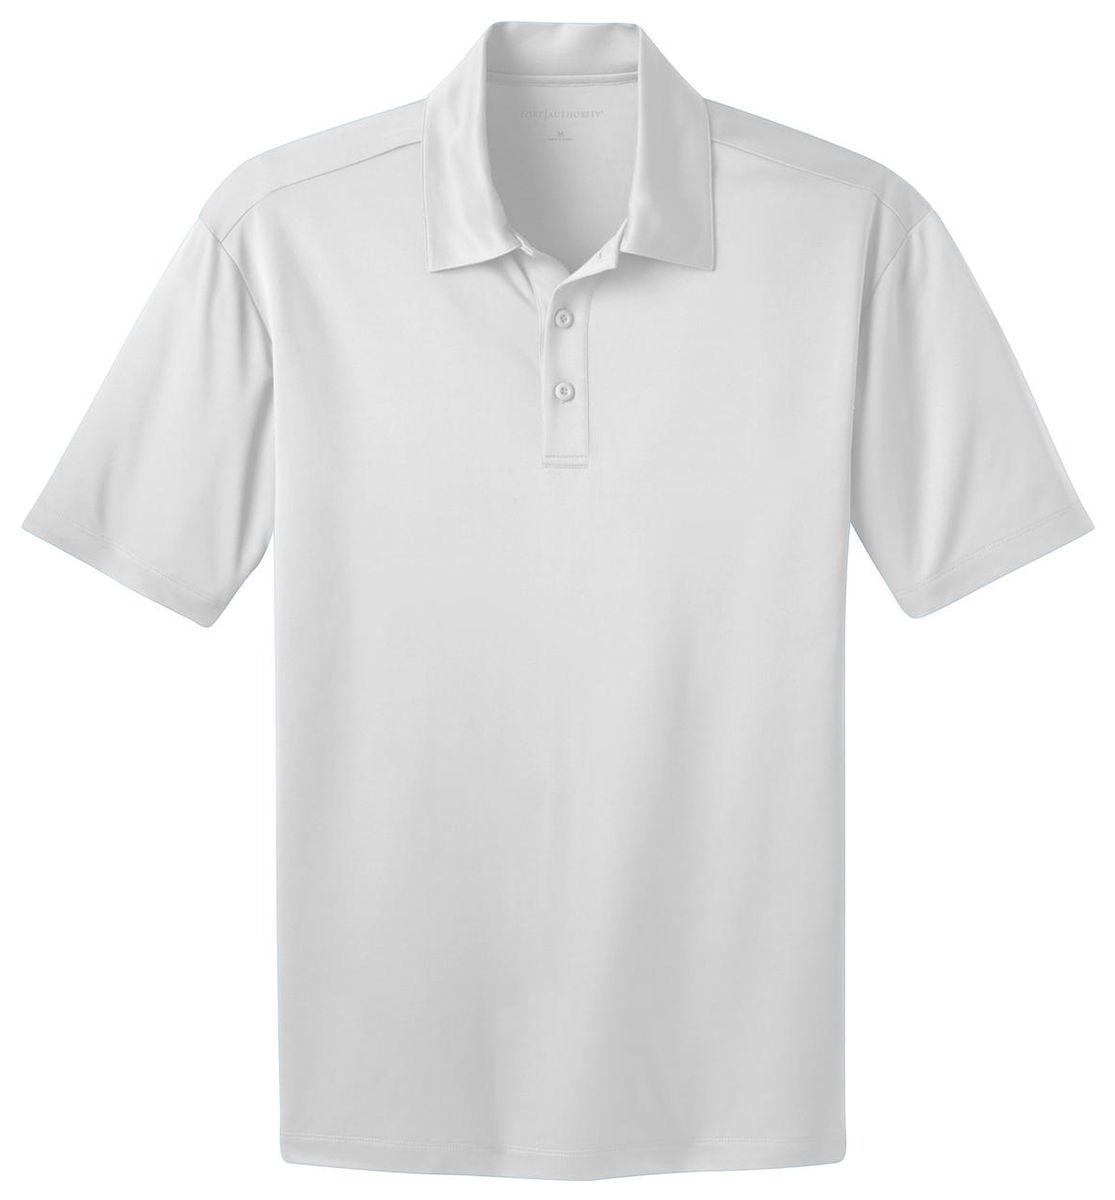 Port Authority Tlk540 Mens Tall Silk Touch Dri Fit Polo Shirt Lt